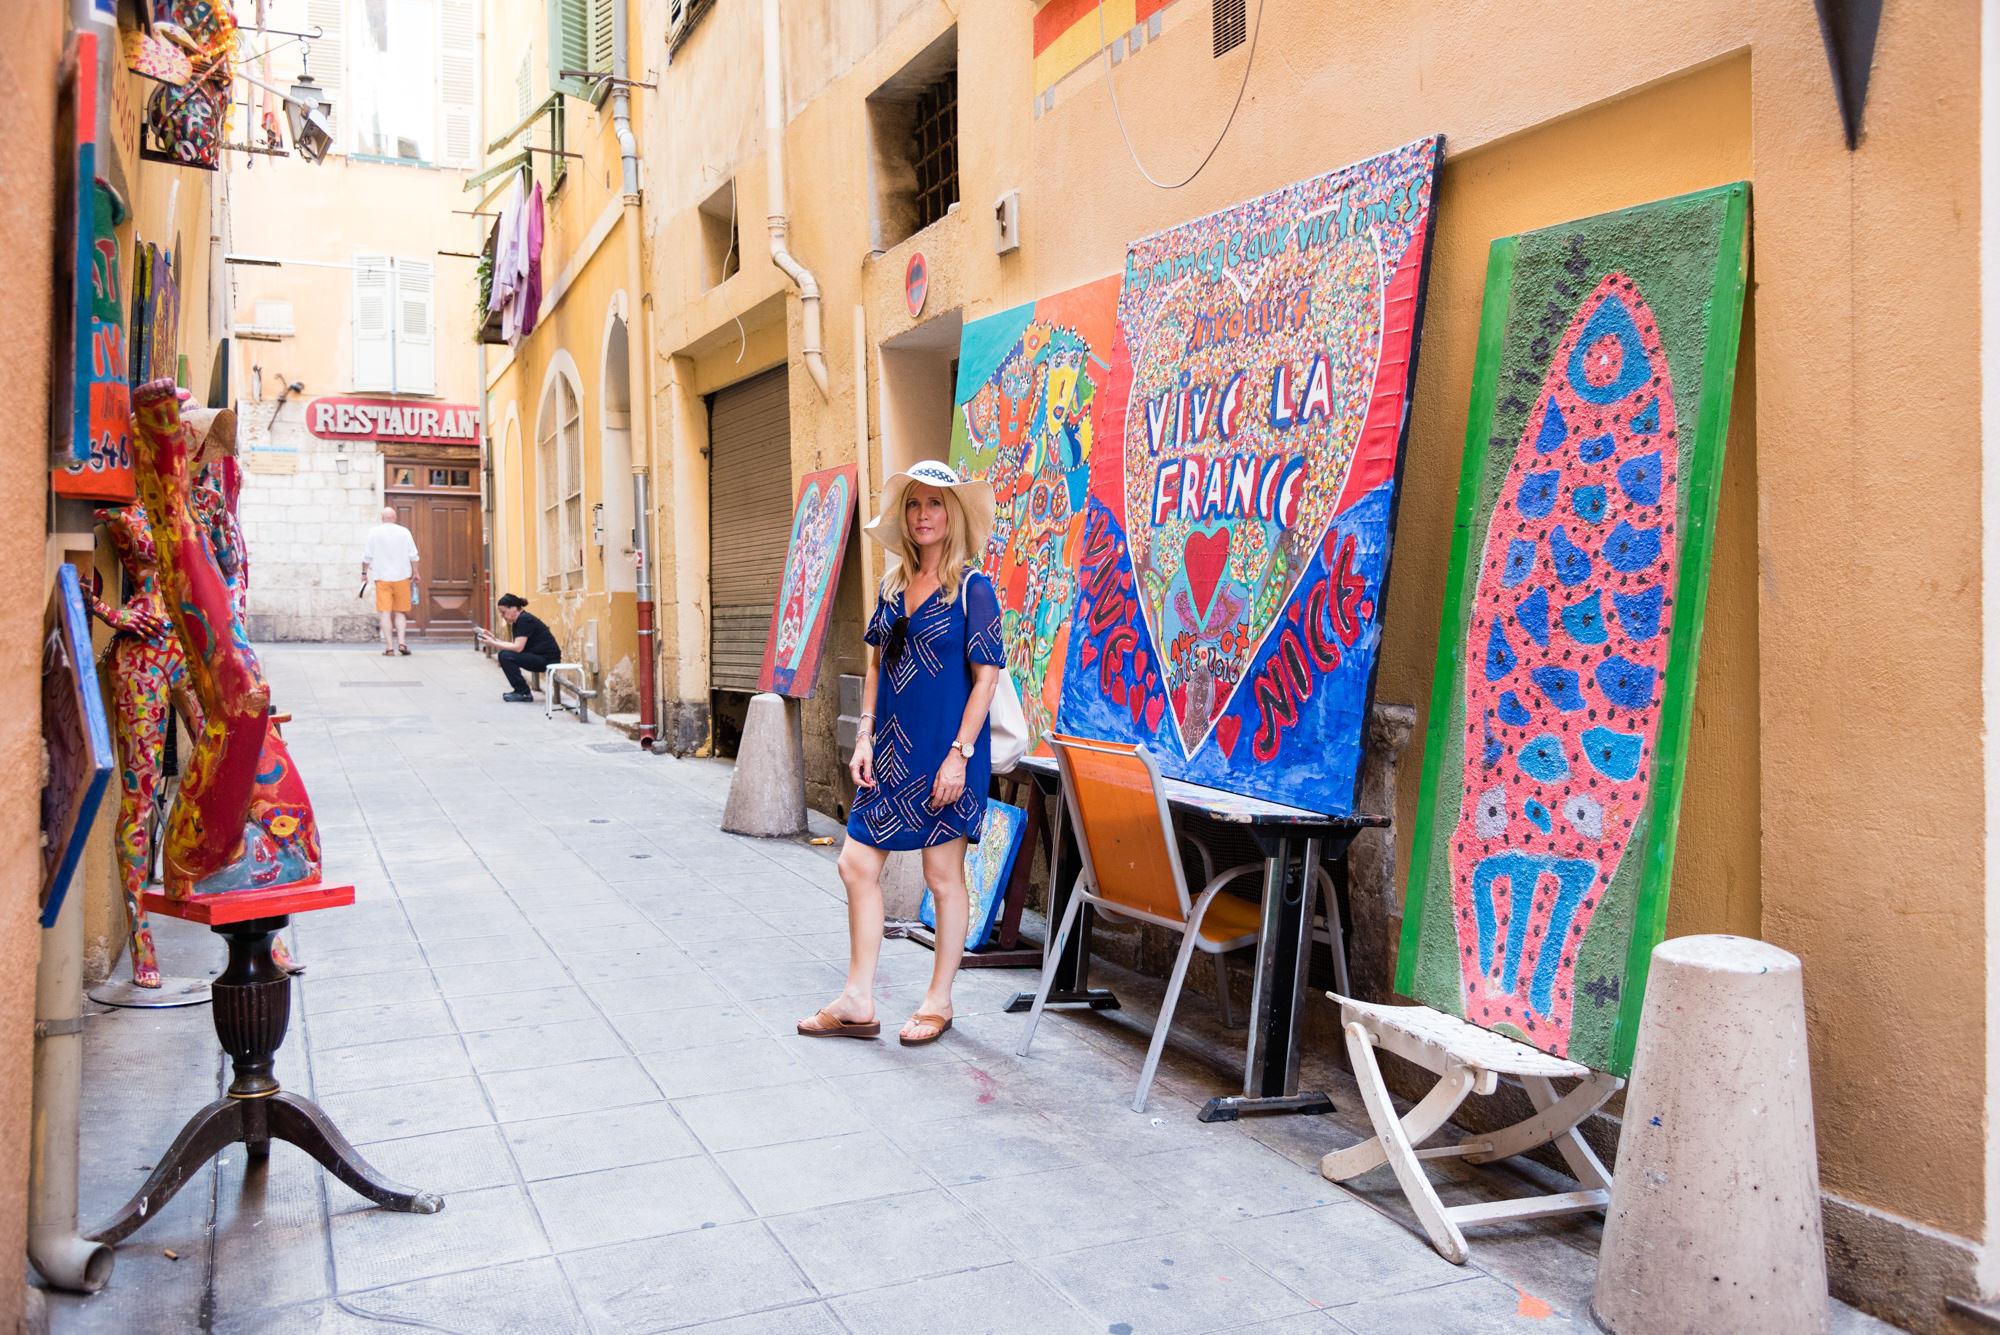 Streets of Nice-1000